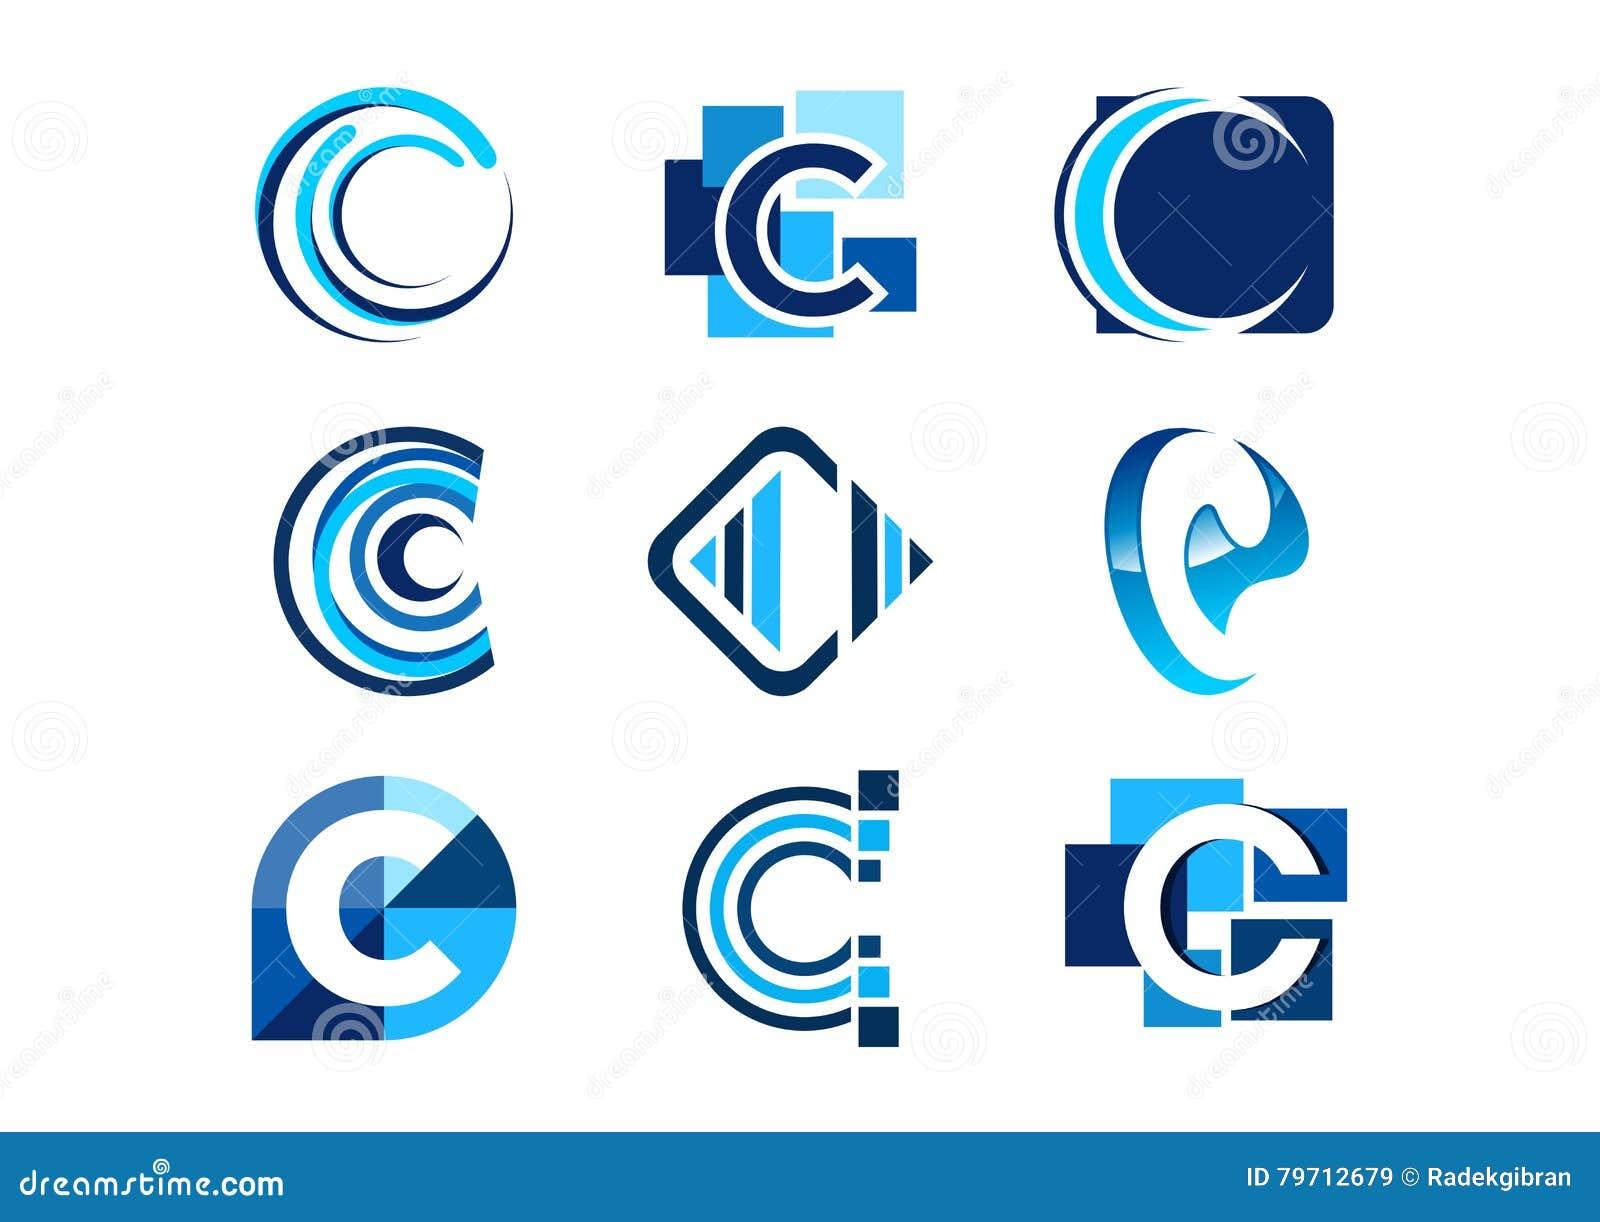 Beschriften Sie c-Logo, Element-Firmenlogos des Konzeptes abstrakte, Satz abstraktes Logogeschäftssammlungssymbolikonen-Vektordes